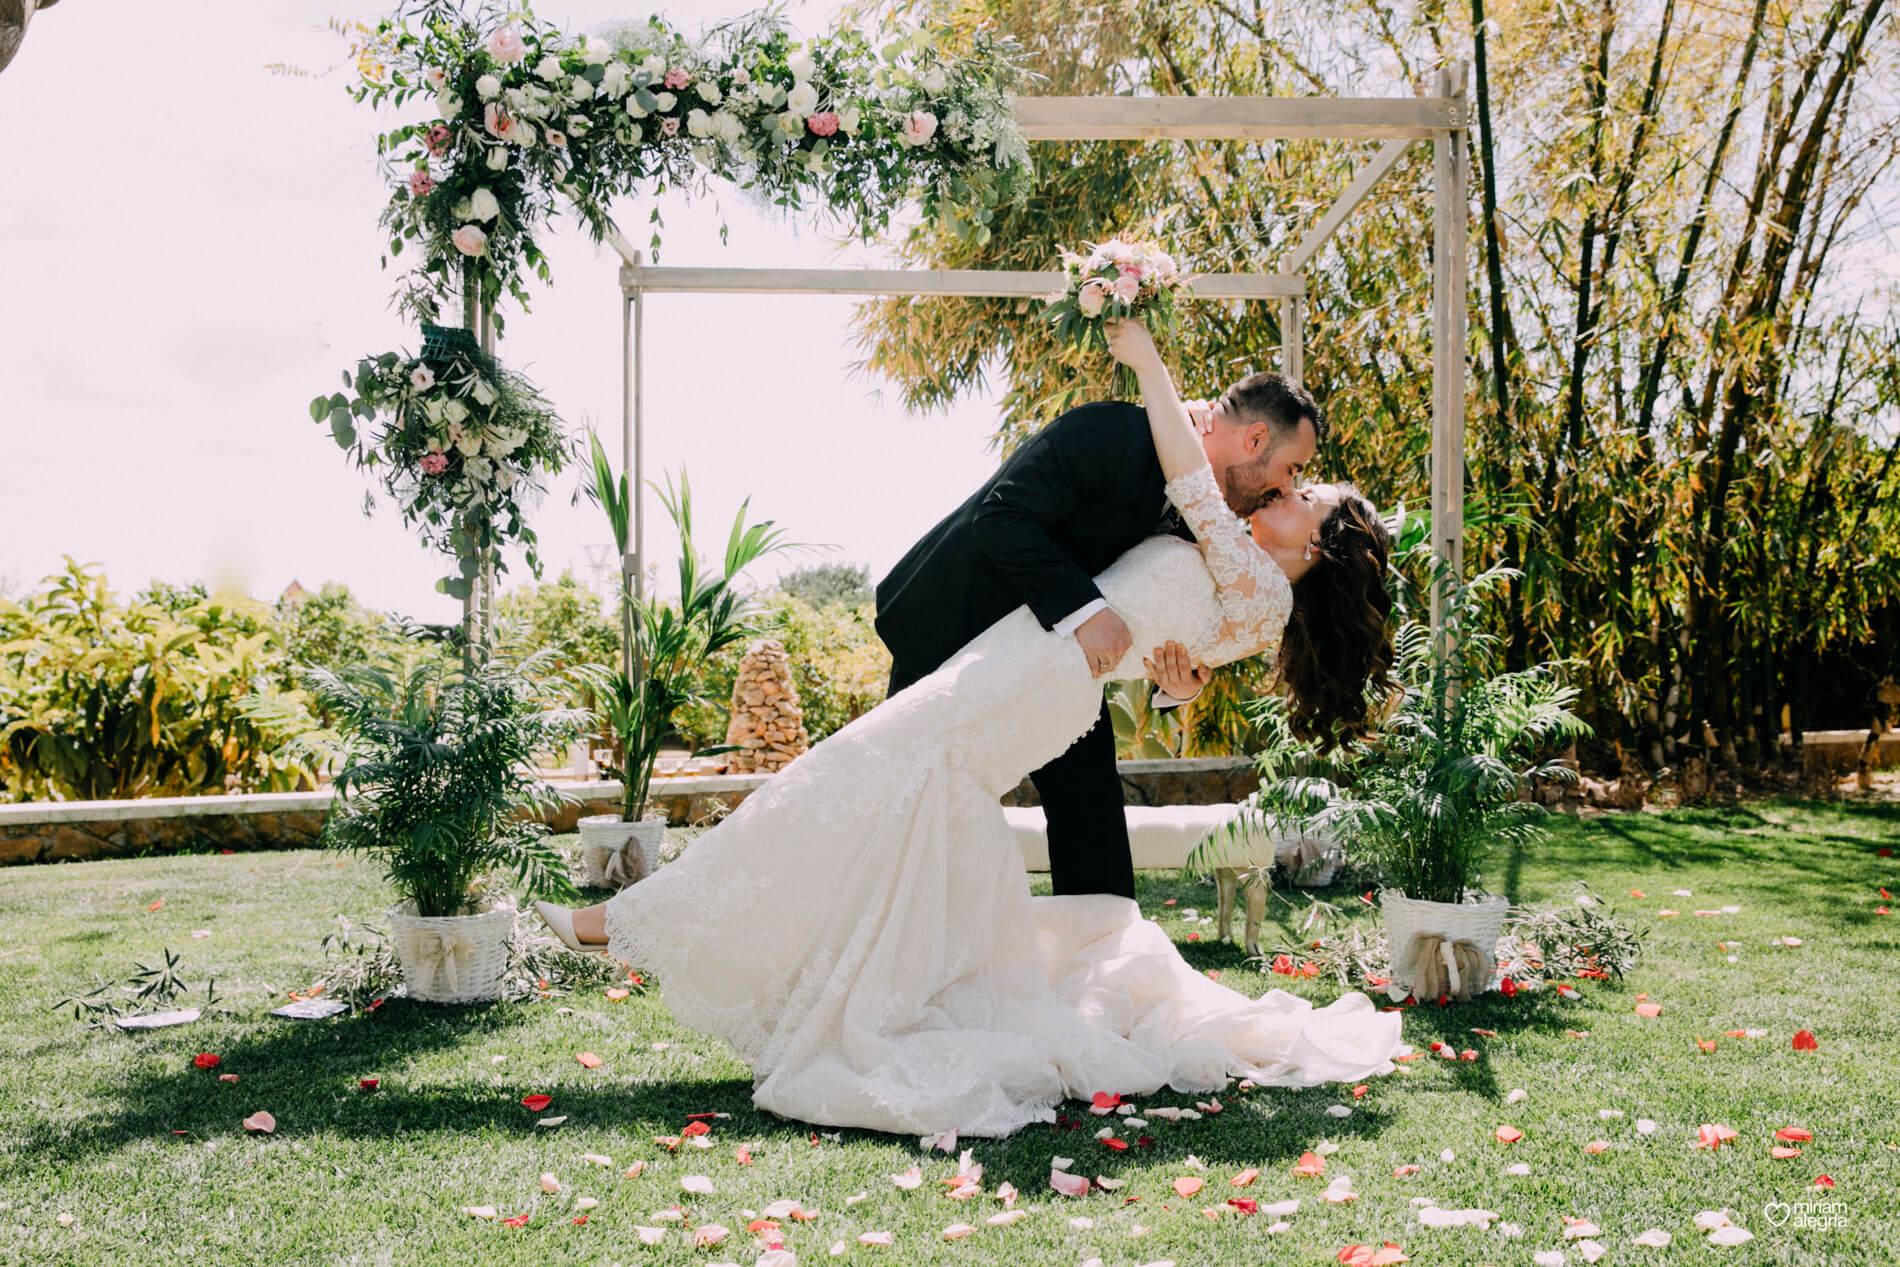 boda-en-finca-jurosa-miriam-alegria-97